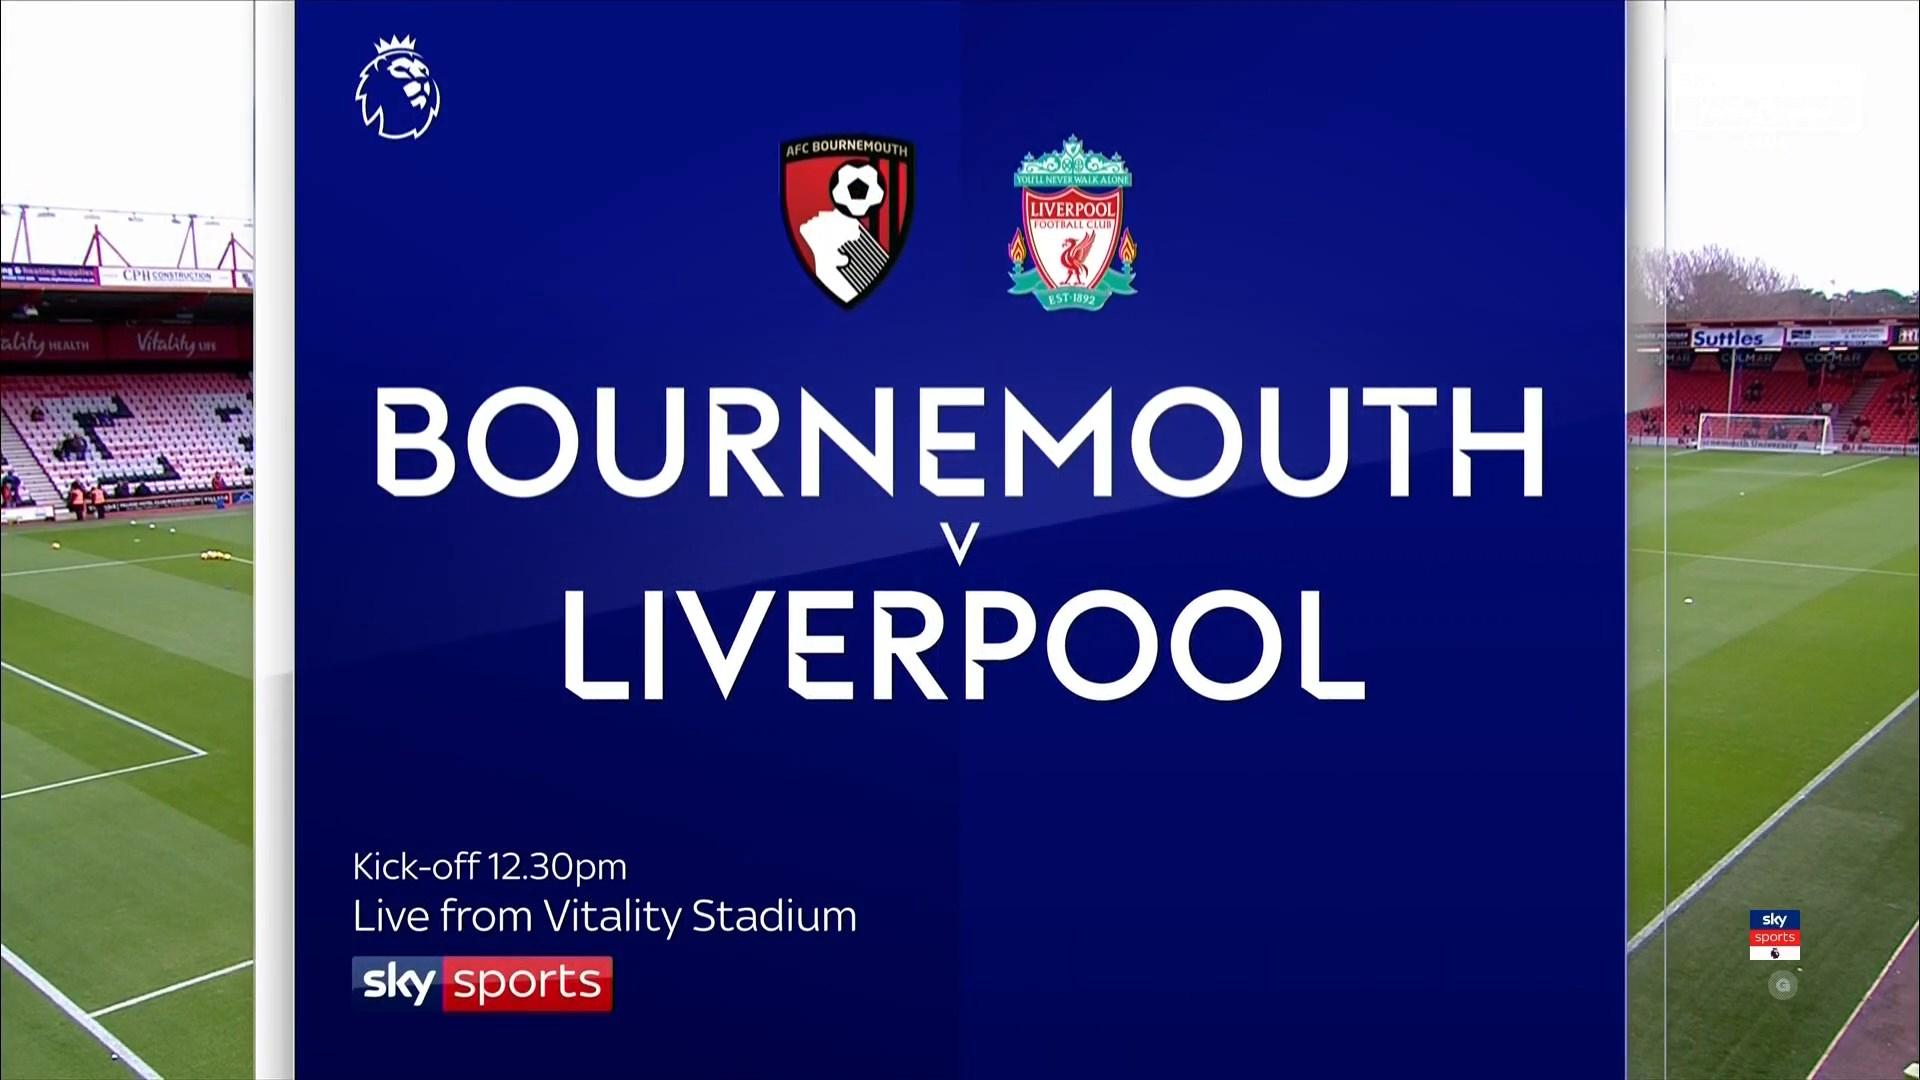 Xem lại: AFC Bournemouth vs Liverpool